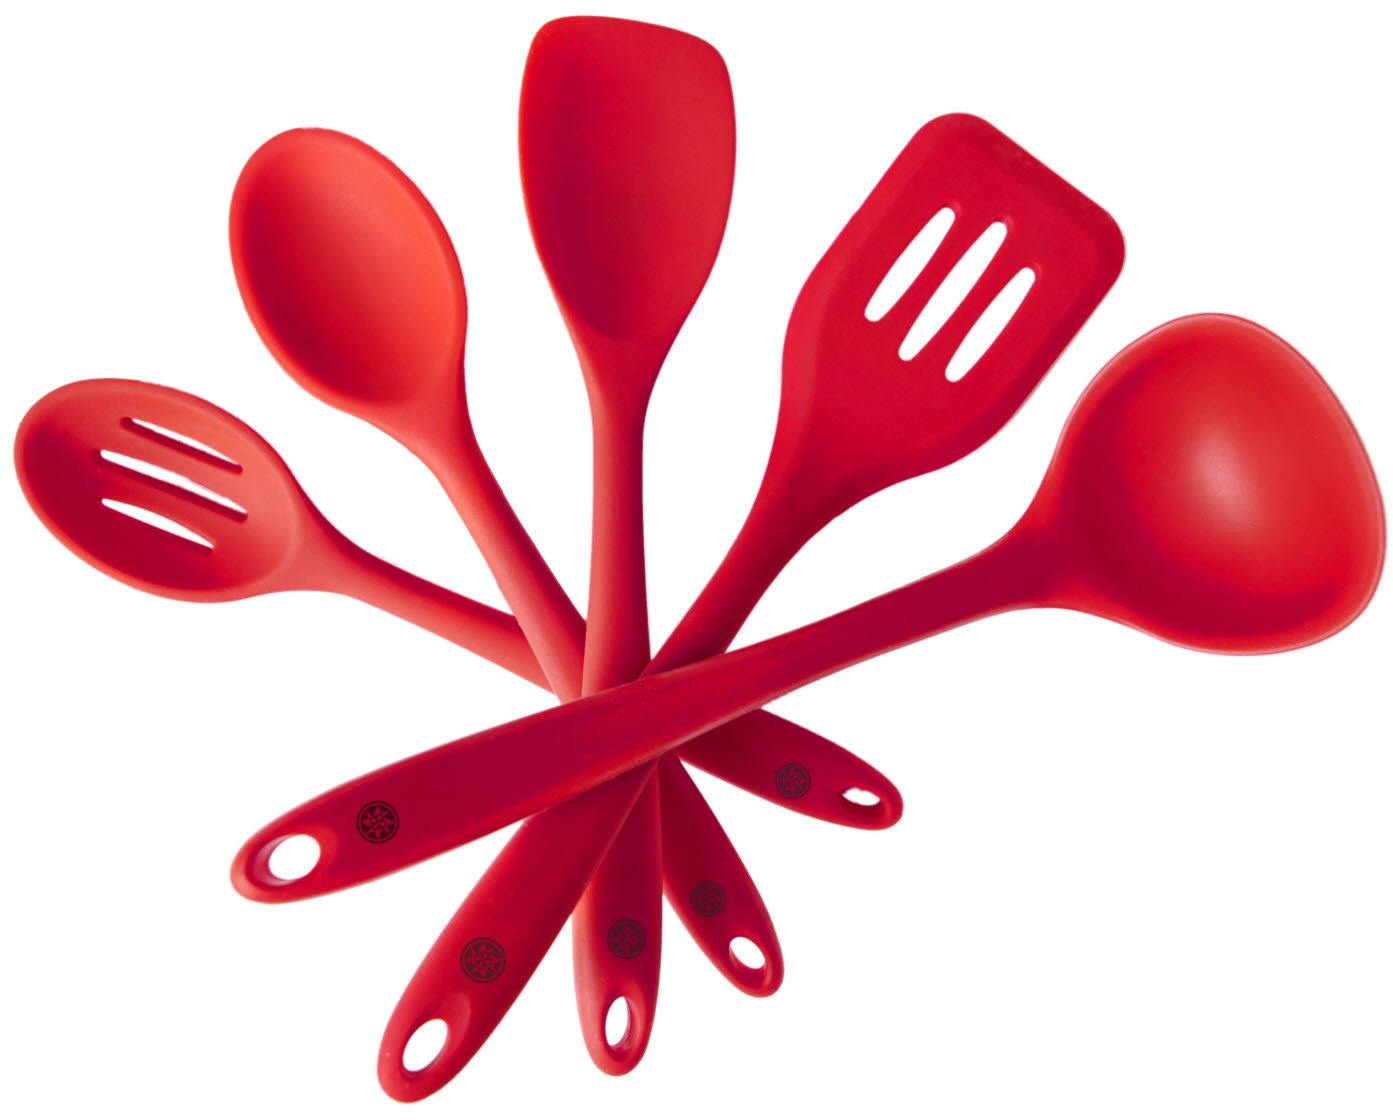 "StarPack Basics Range Silicone Kitchen Utensil Set (5 Piece Set, 10.5"") in FDA Grade + Bonus 101 Cooking Tips - Cherry Red"